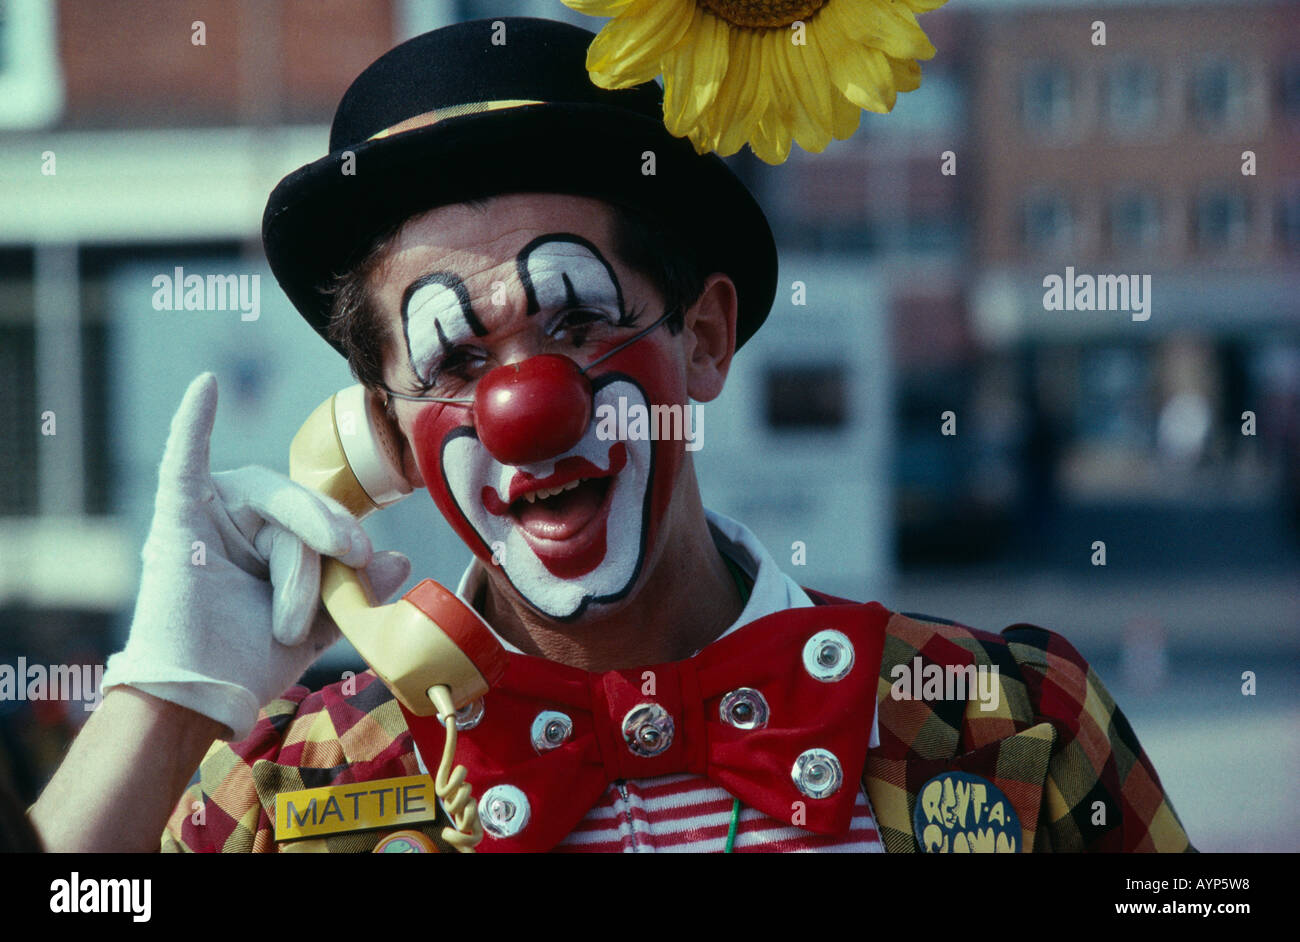 clown convention bognor regis stock photos u0026 clown convention